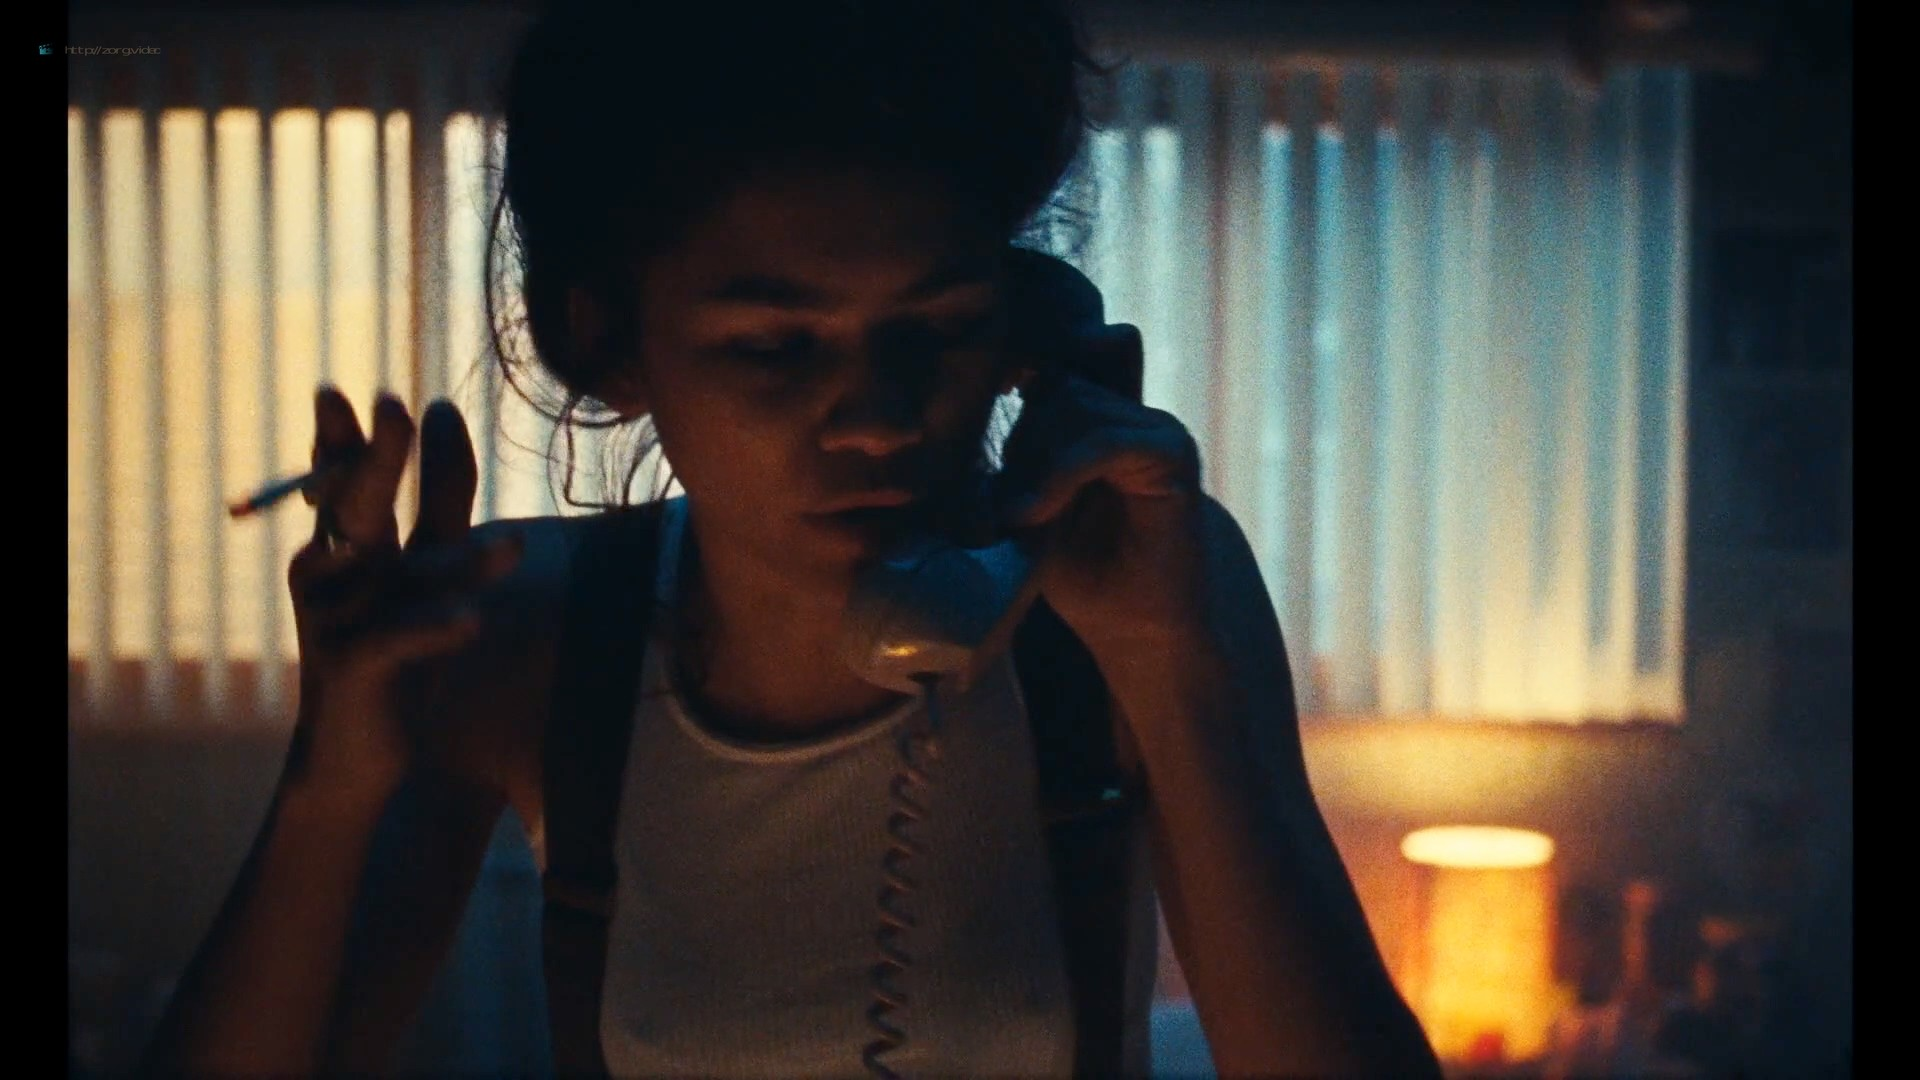 Hunter Schafer nude topless, Sydney Sweeney, Zendaya hot - Euphoria (2019) s1e7 HD 1080p (10)